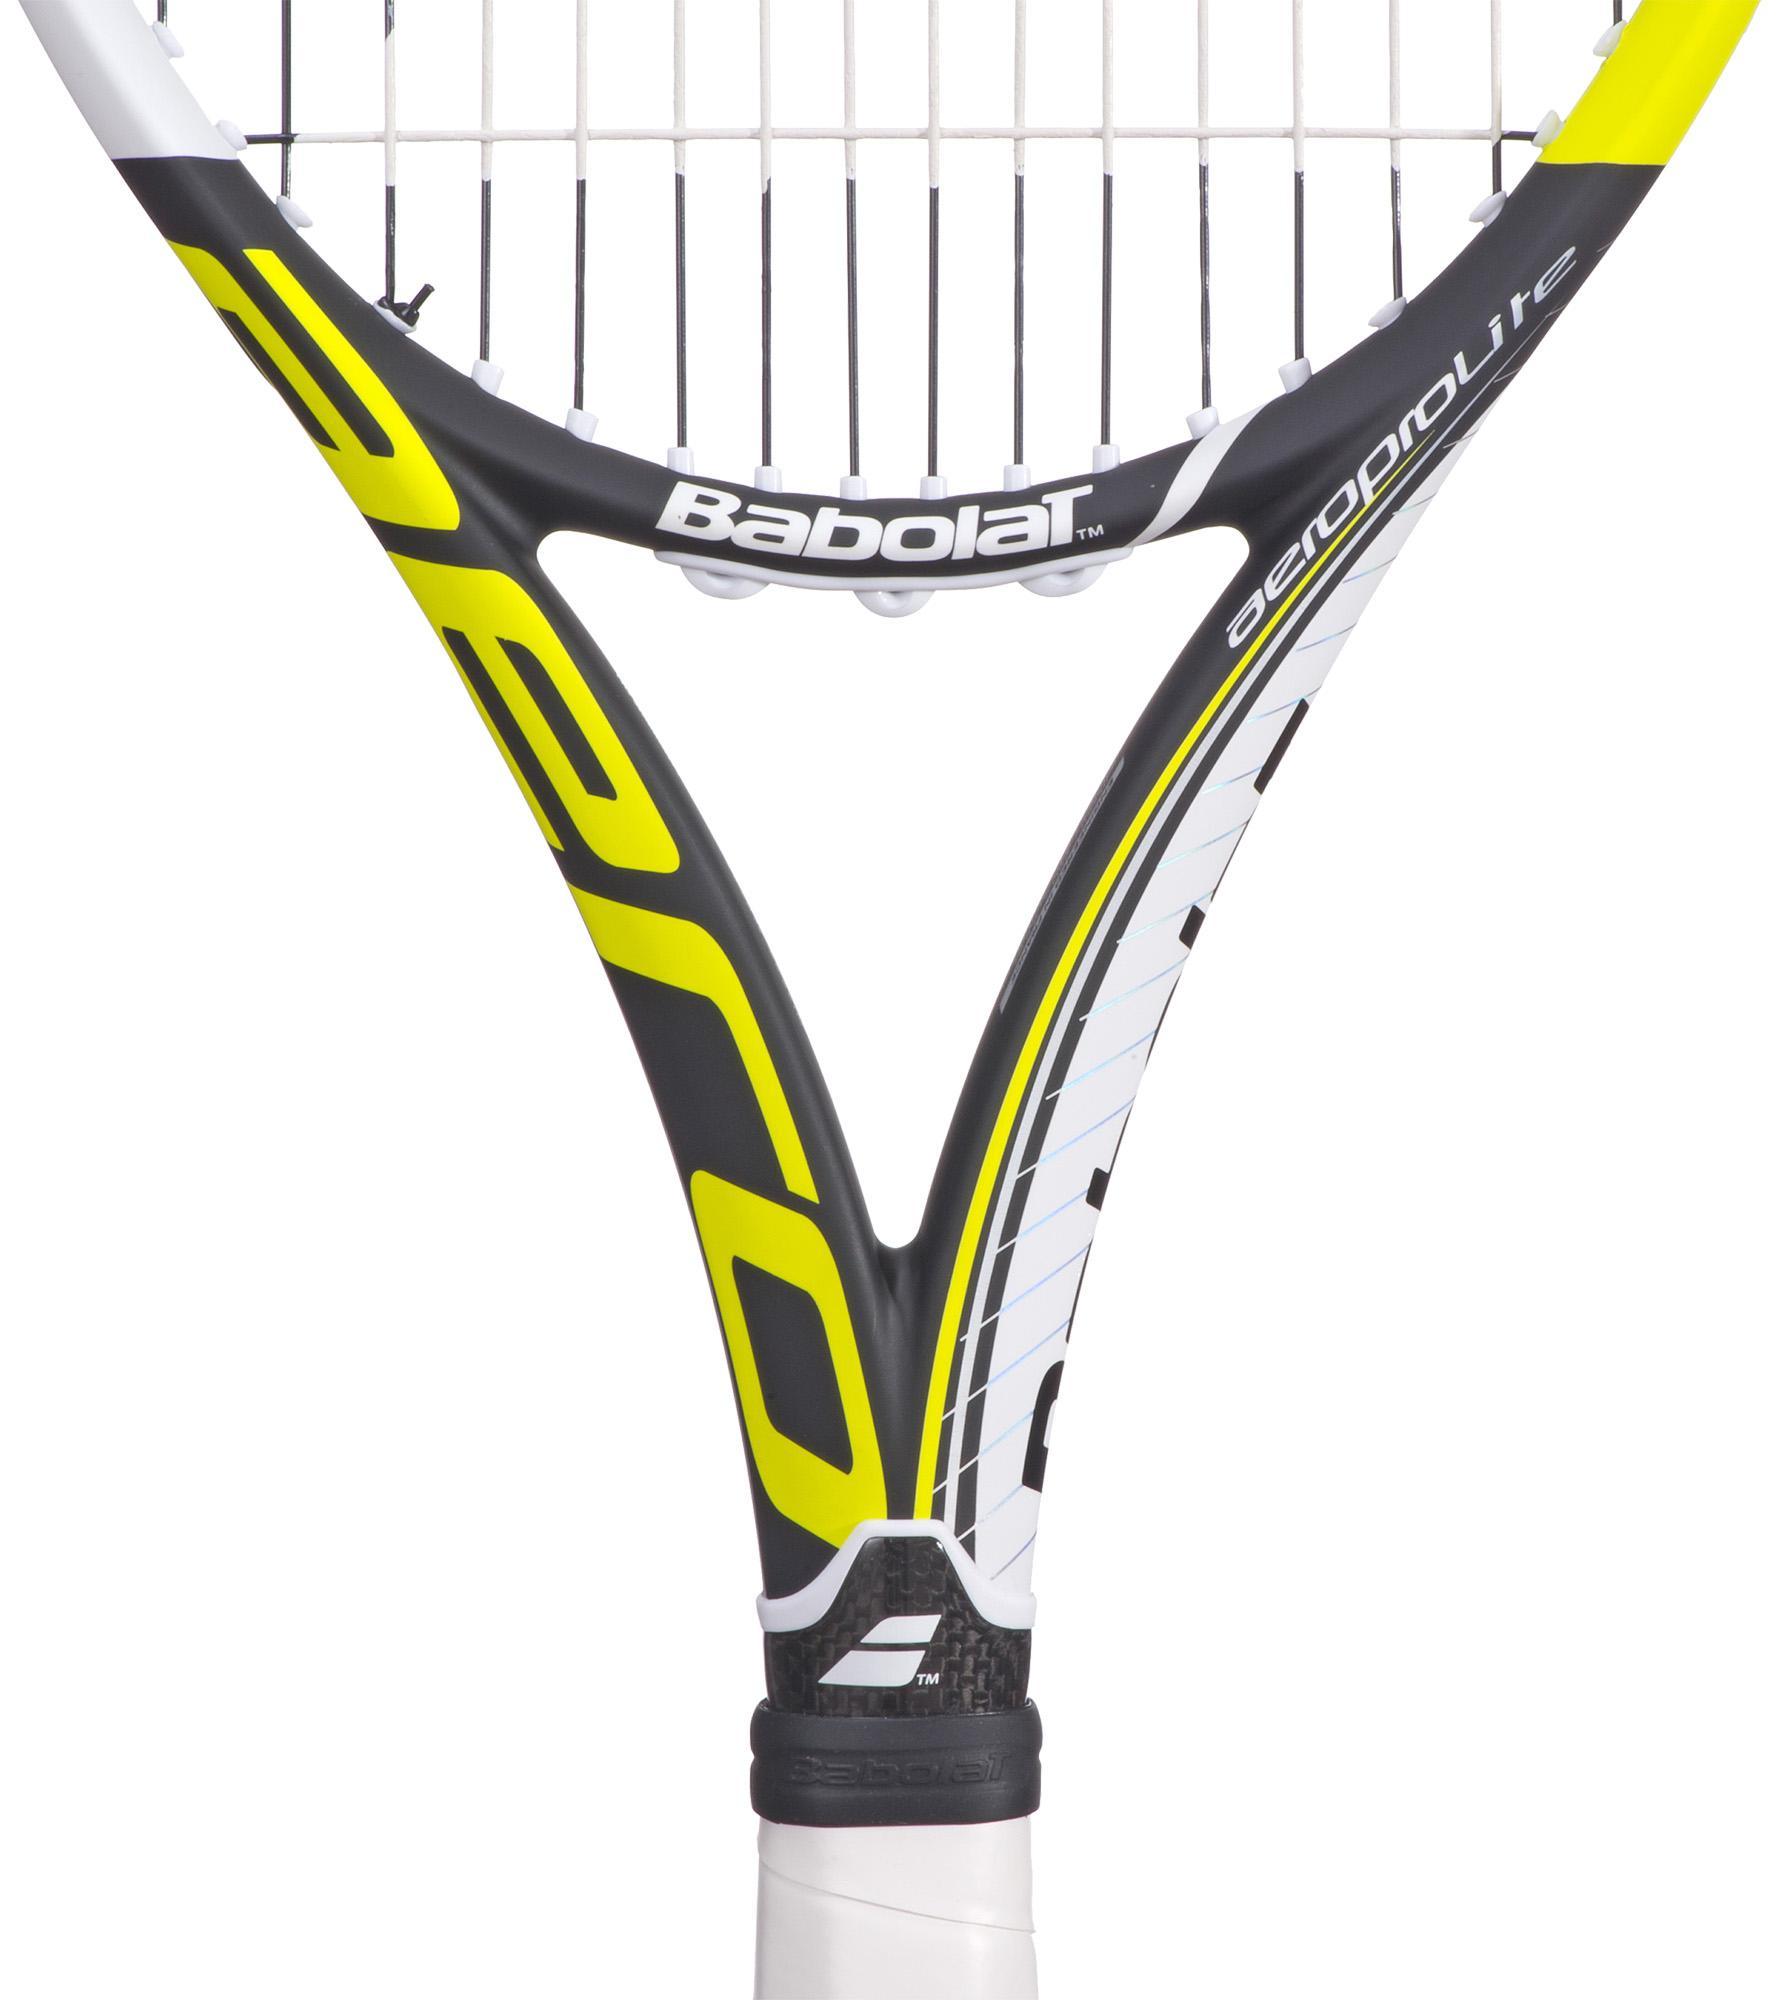 Babolat AeroPro Lite Tennis Racket - Tennisnuts.com 2a1c70b76776b